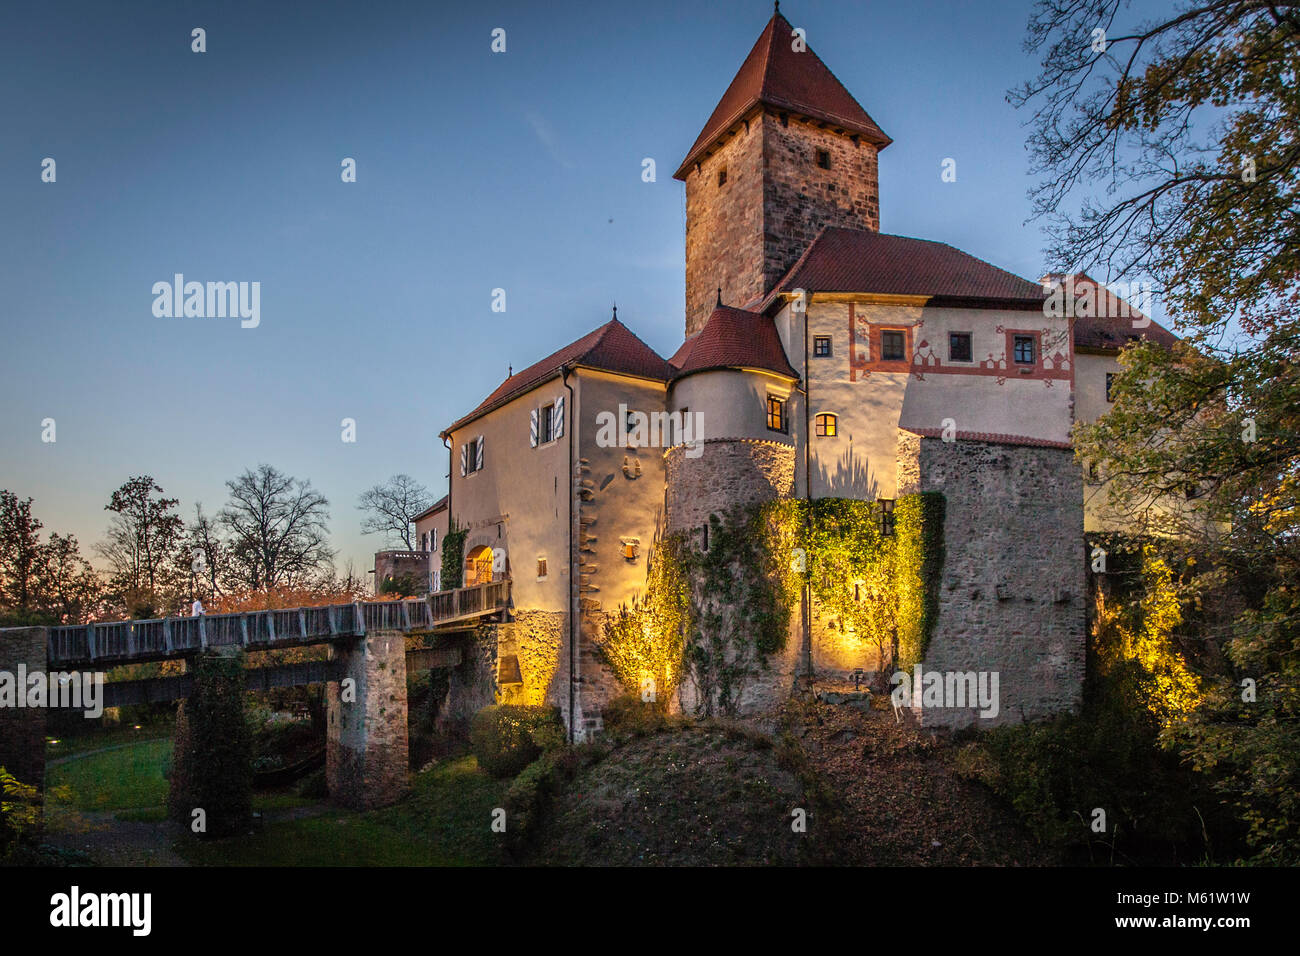 Burg Wernberg German castle in Bavaria in a waft of mist - Stock Image